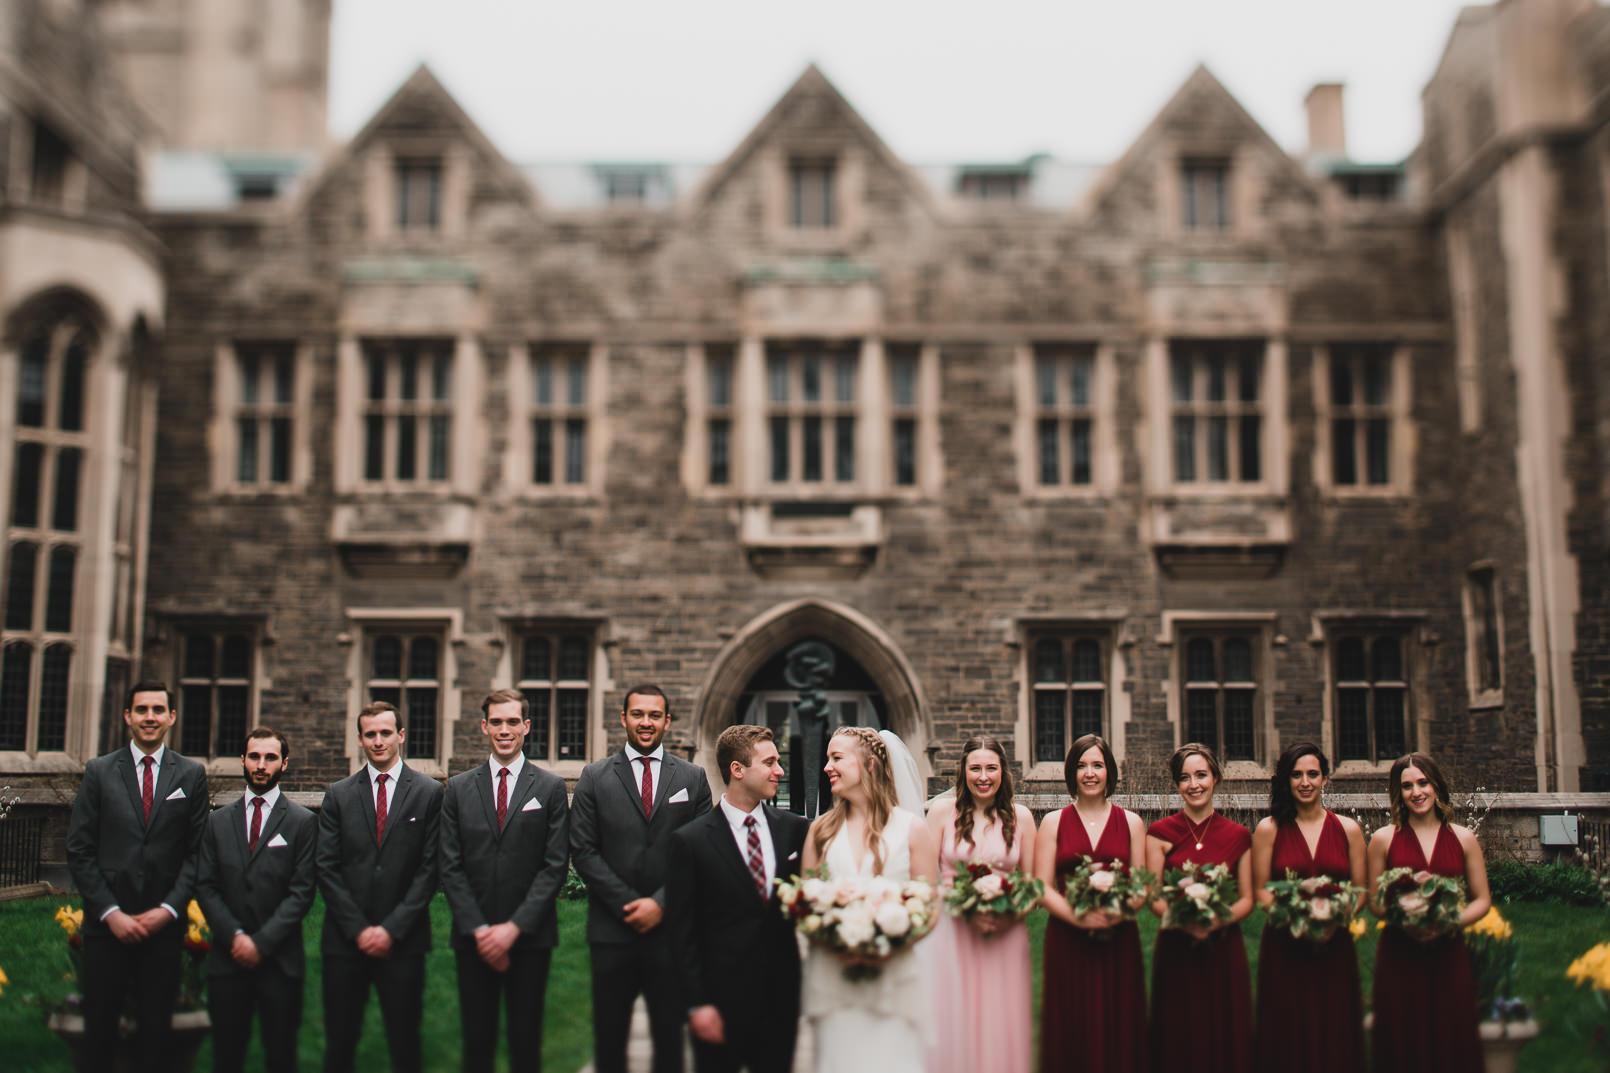 029-Jonathan-Kuhn-Photography-Wedding-_mini.jpg